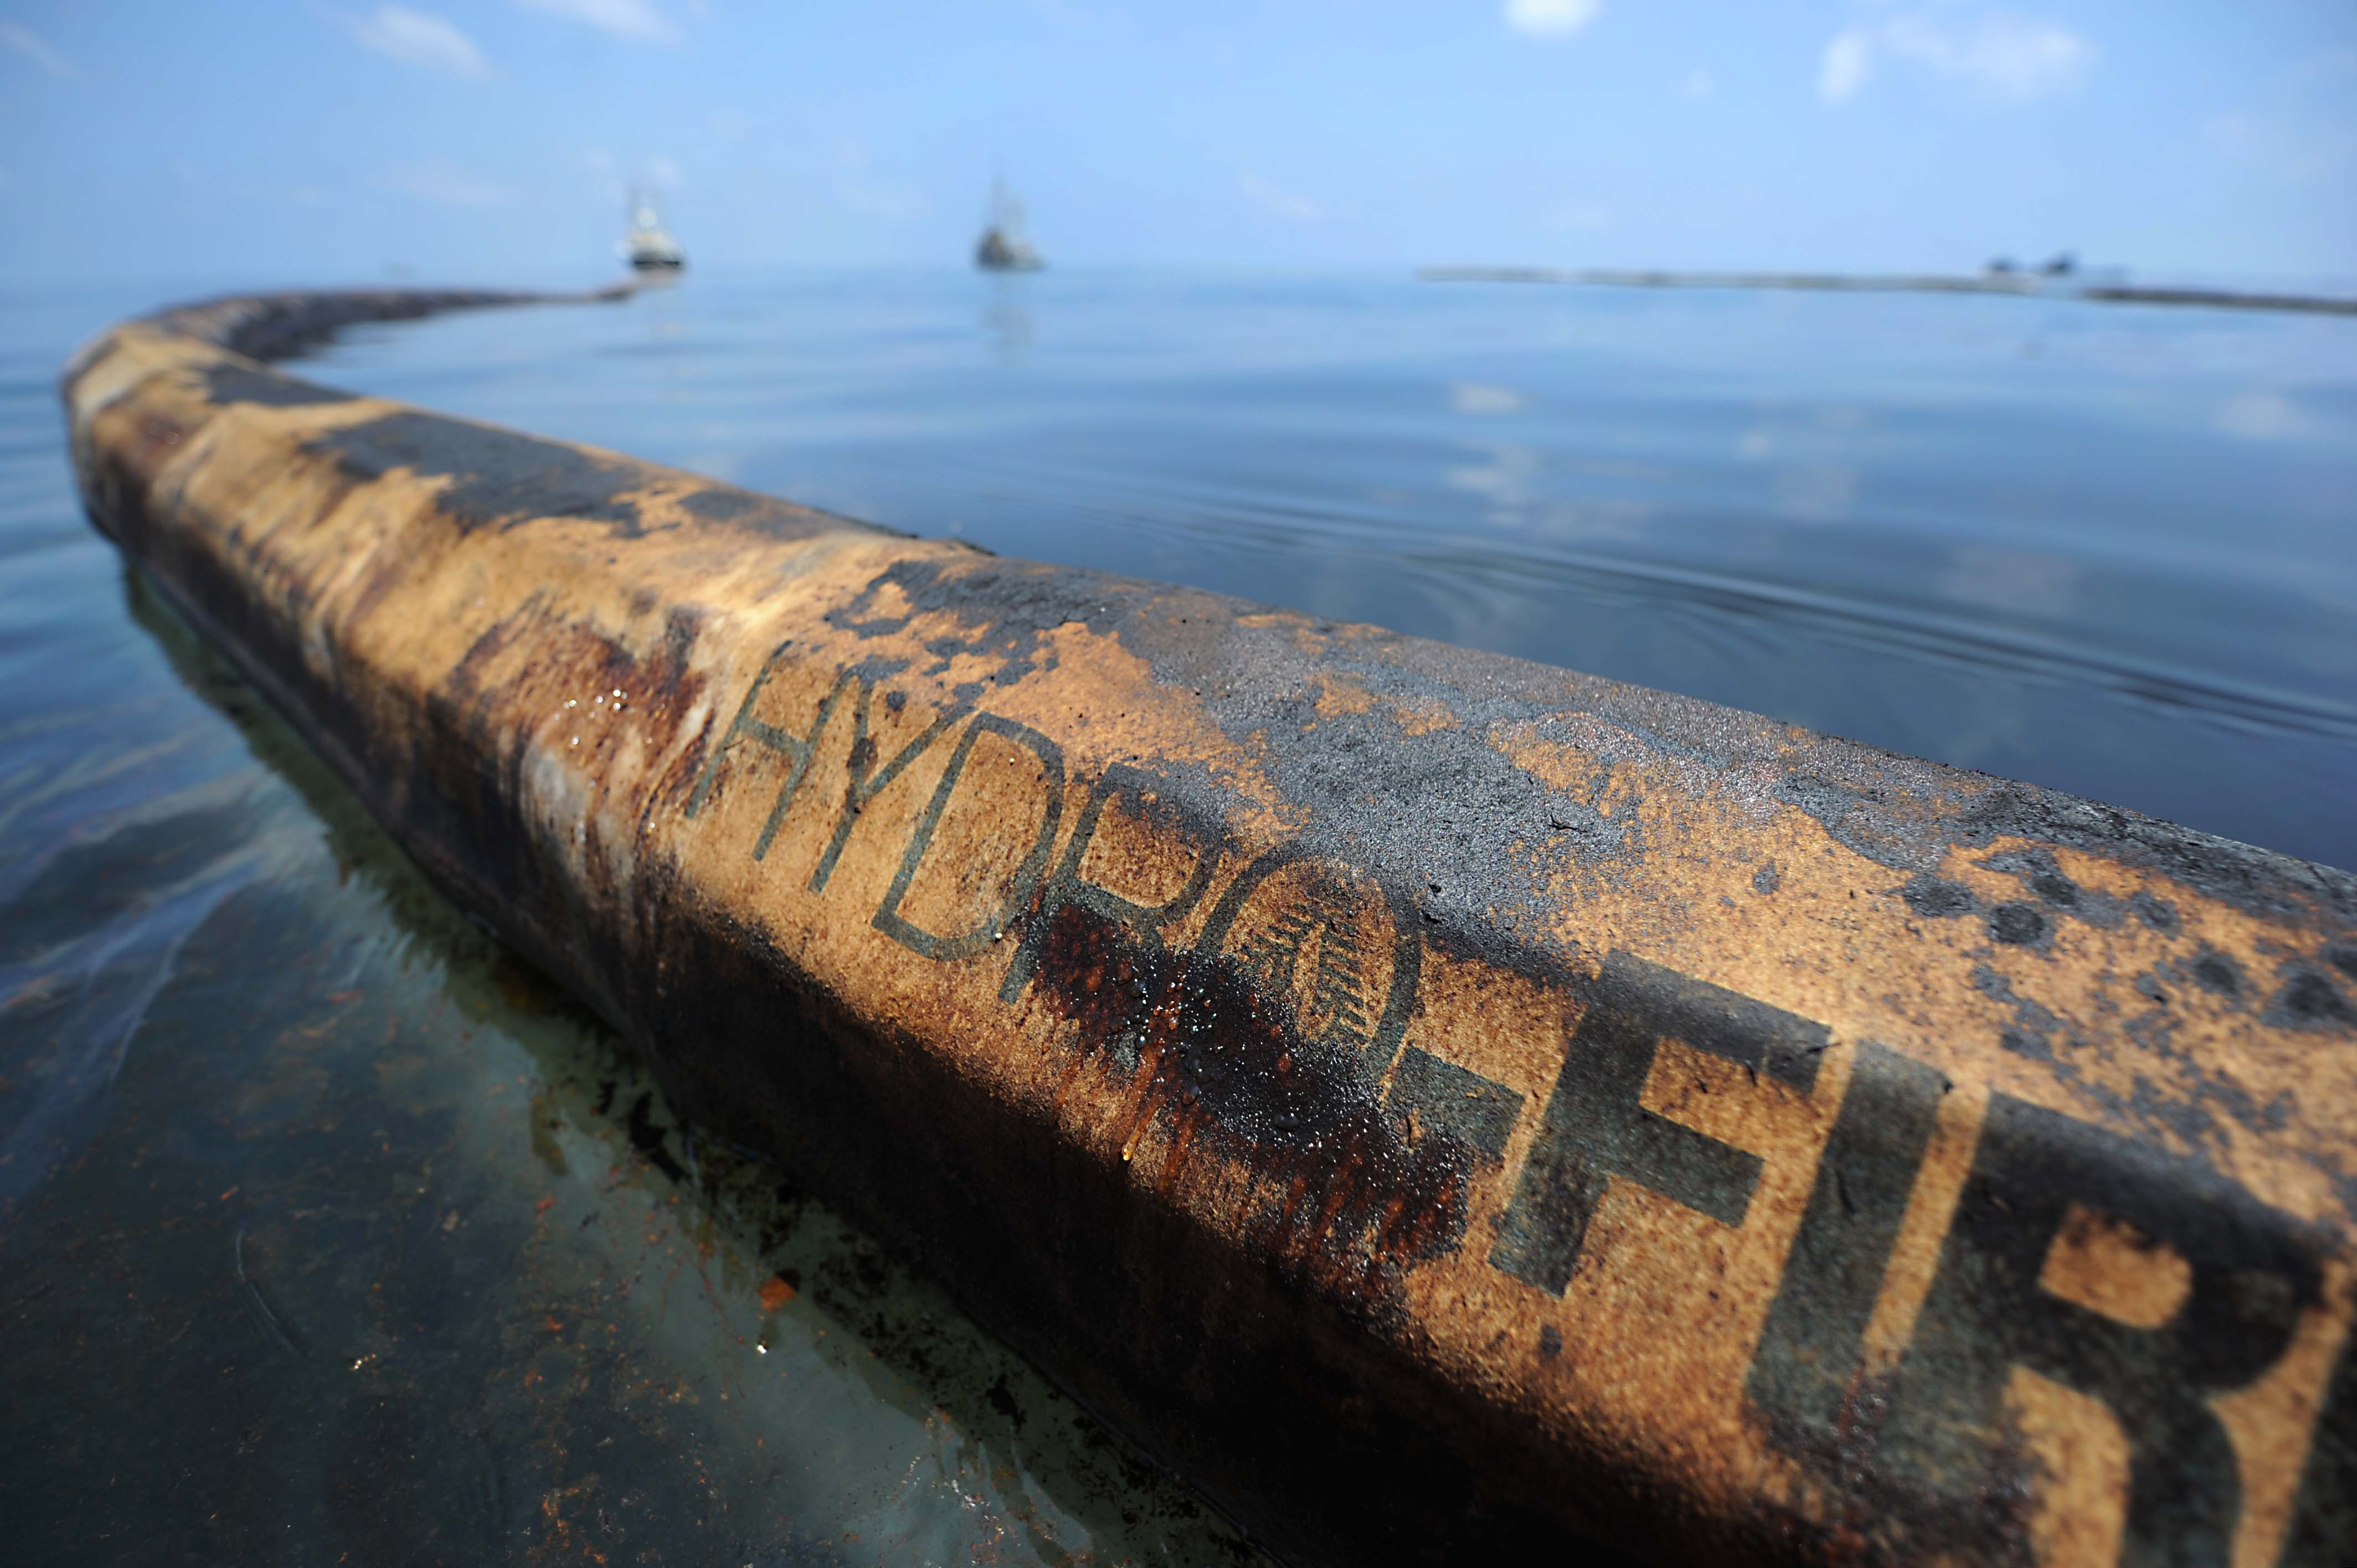 Massive Oil Slick Threatens U.S. Gulf Coast